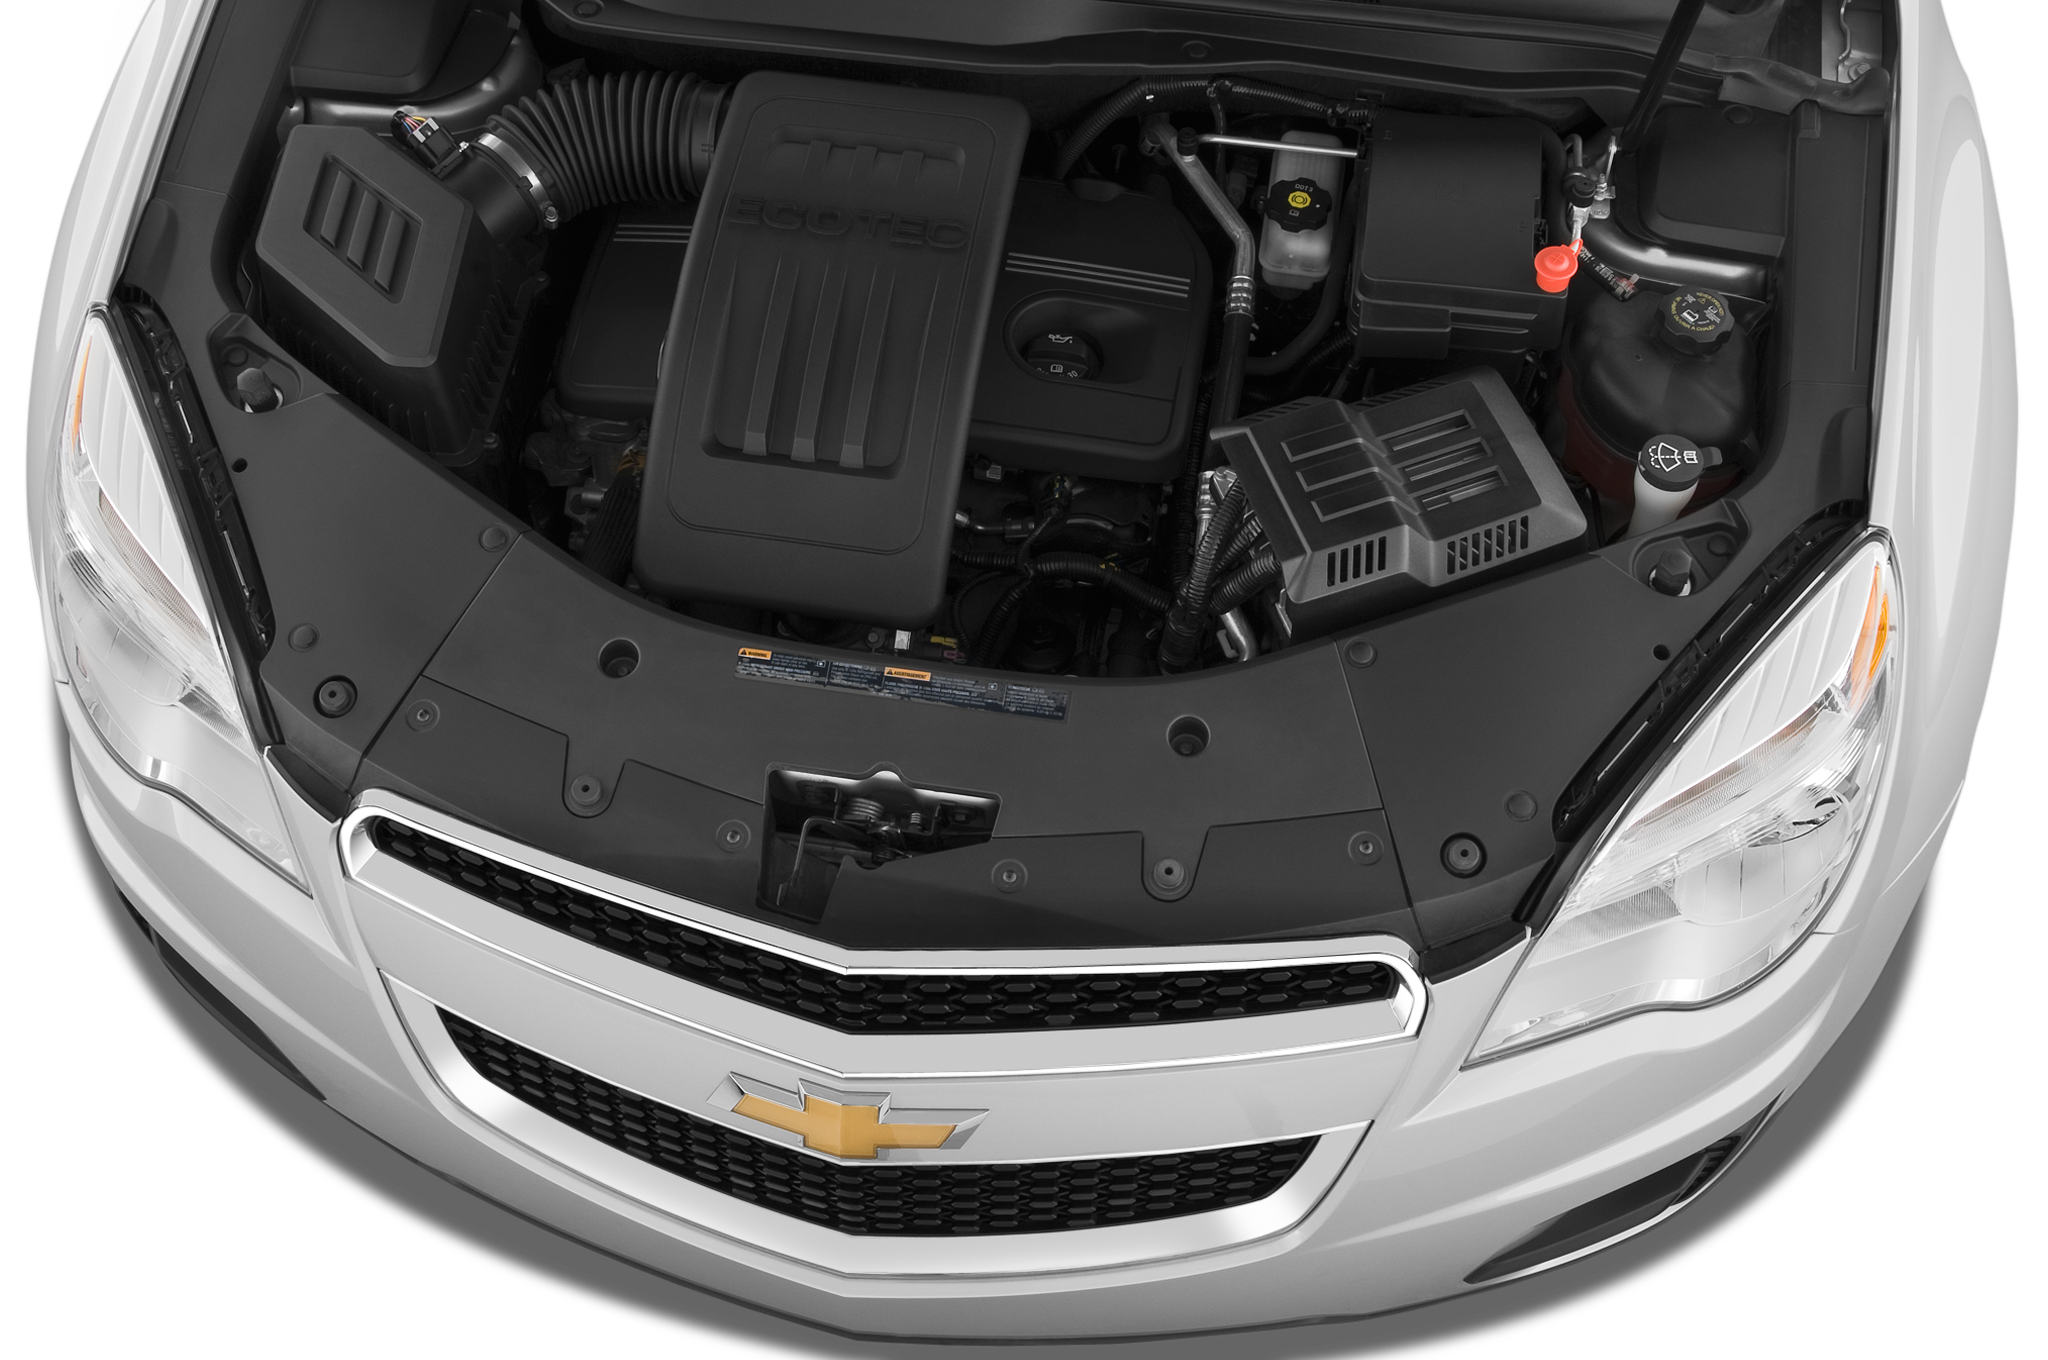 Chevy Traverse Mpg >> 2010 Chevy Equinox LTZ AWD - Chevrolet Crossover SUV Review - Automobile Magazine